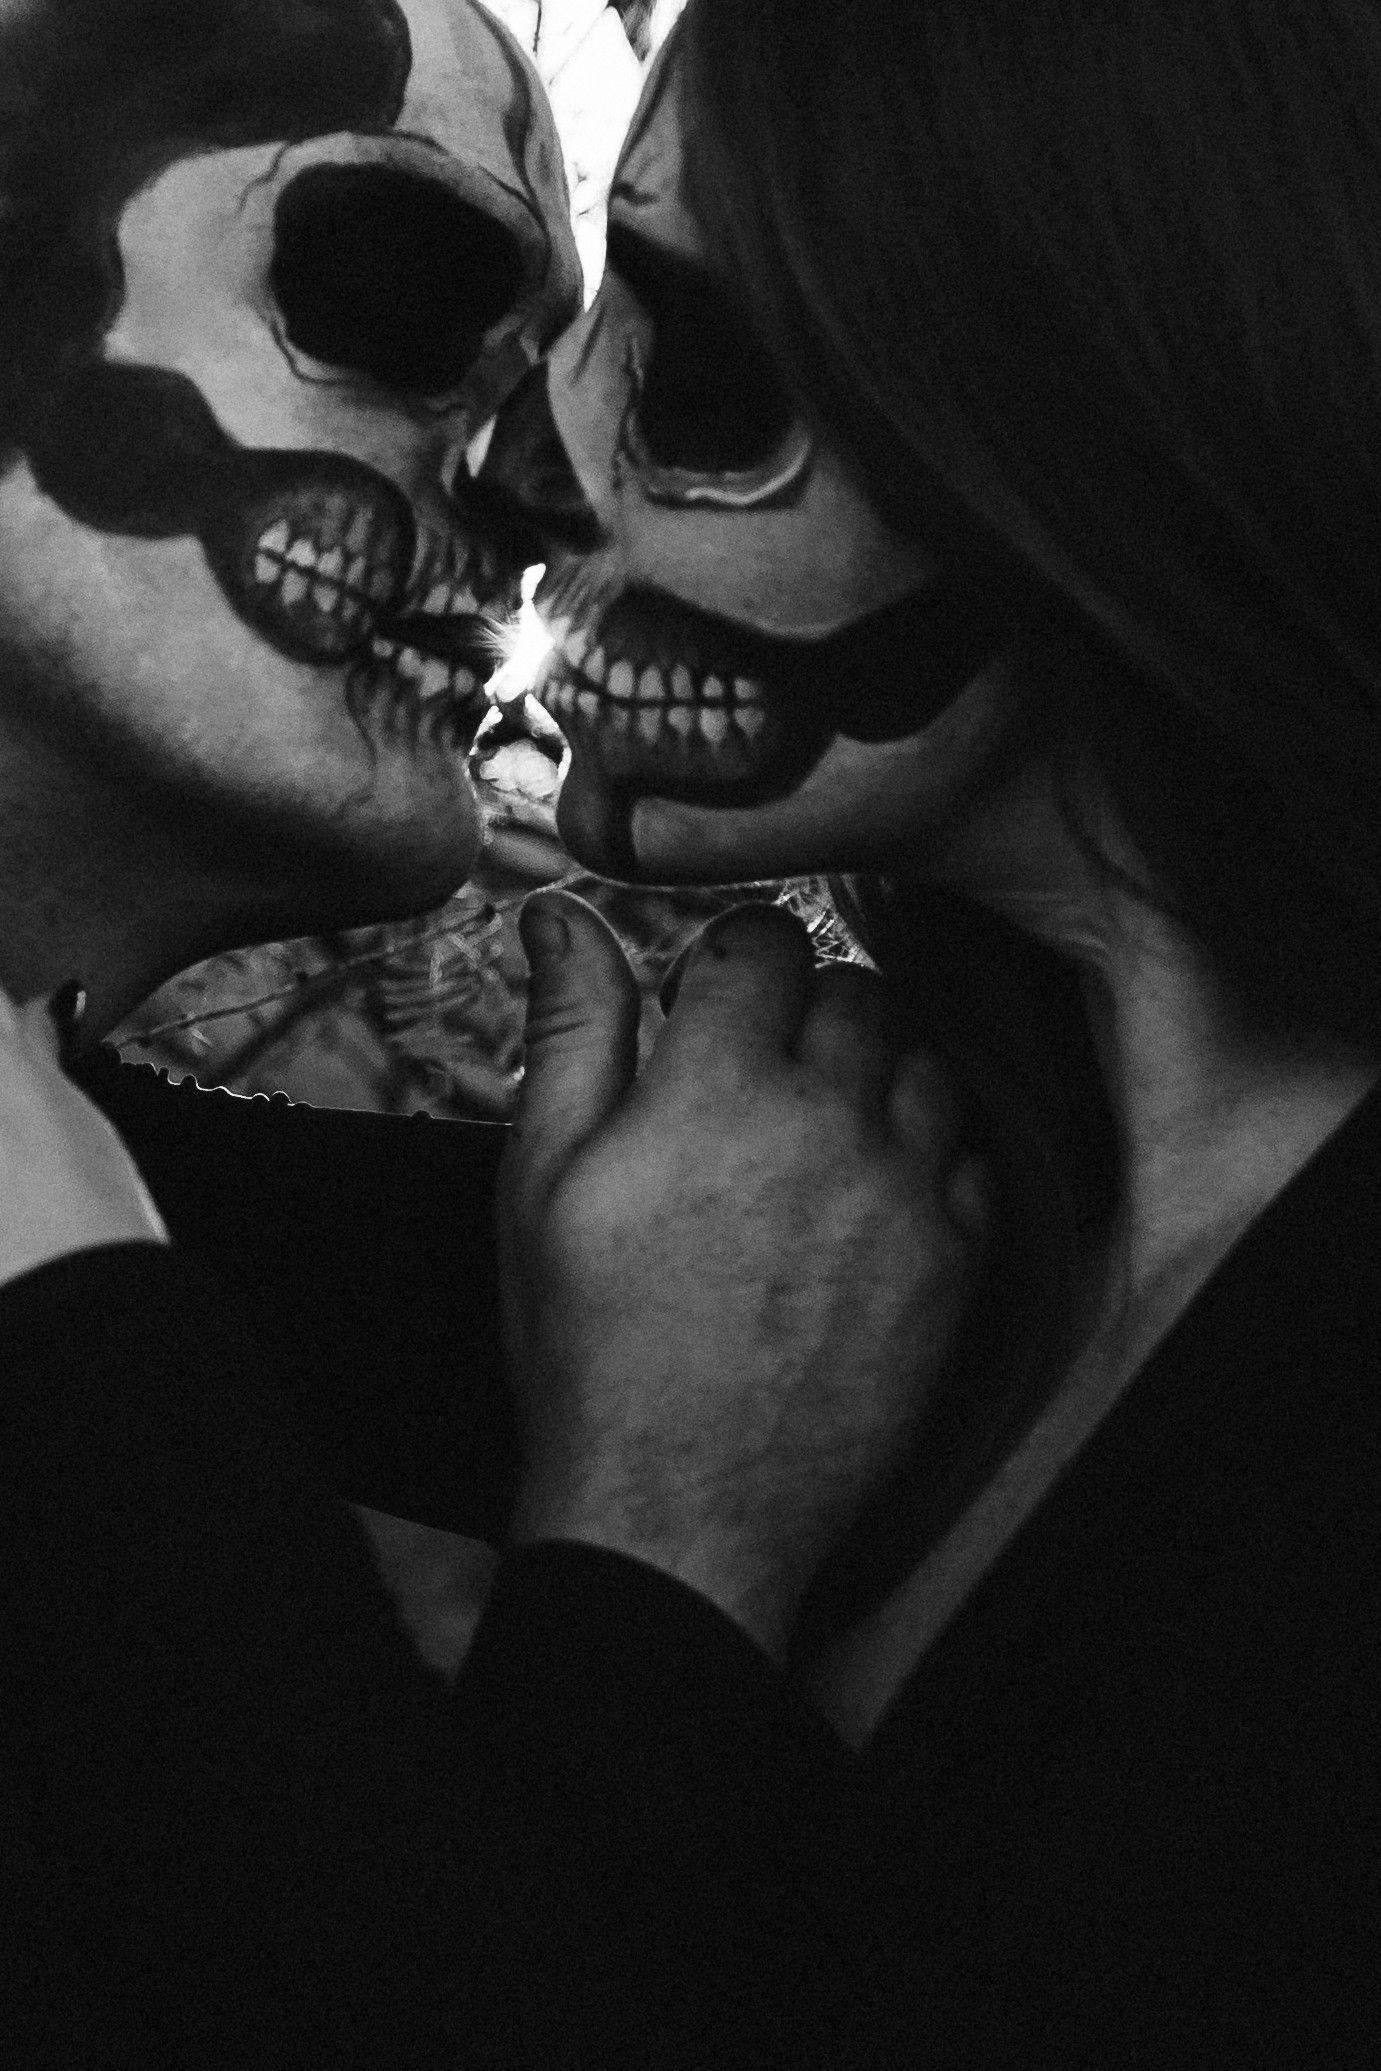 Till Death 💀🖤 Halloween photoshoot IG @tnishadawsonphotography #arizonaphotographer #azphotog #arizonalgbtqphotographer #arizonalove #allblackeverything #bandw #blackandwhitephotography #blackweddingdress #bride #darkandmoody #desertdreaming #elope #elopementphotographer #fall #halloween #halloweenphotoshoot #halloweencouple #photographyismagic #photographthesoul #portraits #rawemotions #radcreative #shotwithlove #skullmakeup #spookyseason #spookycouple #skeletoncouple